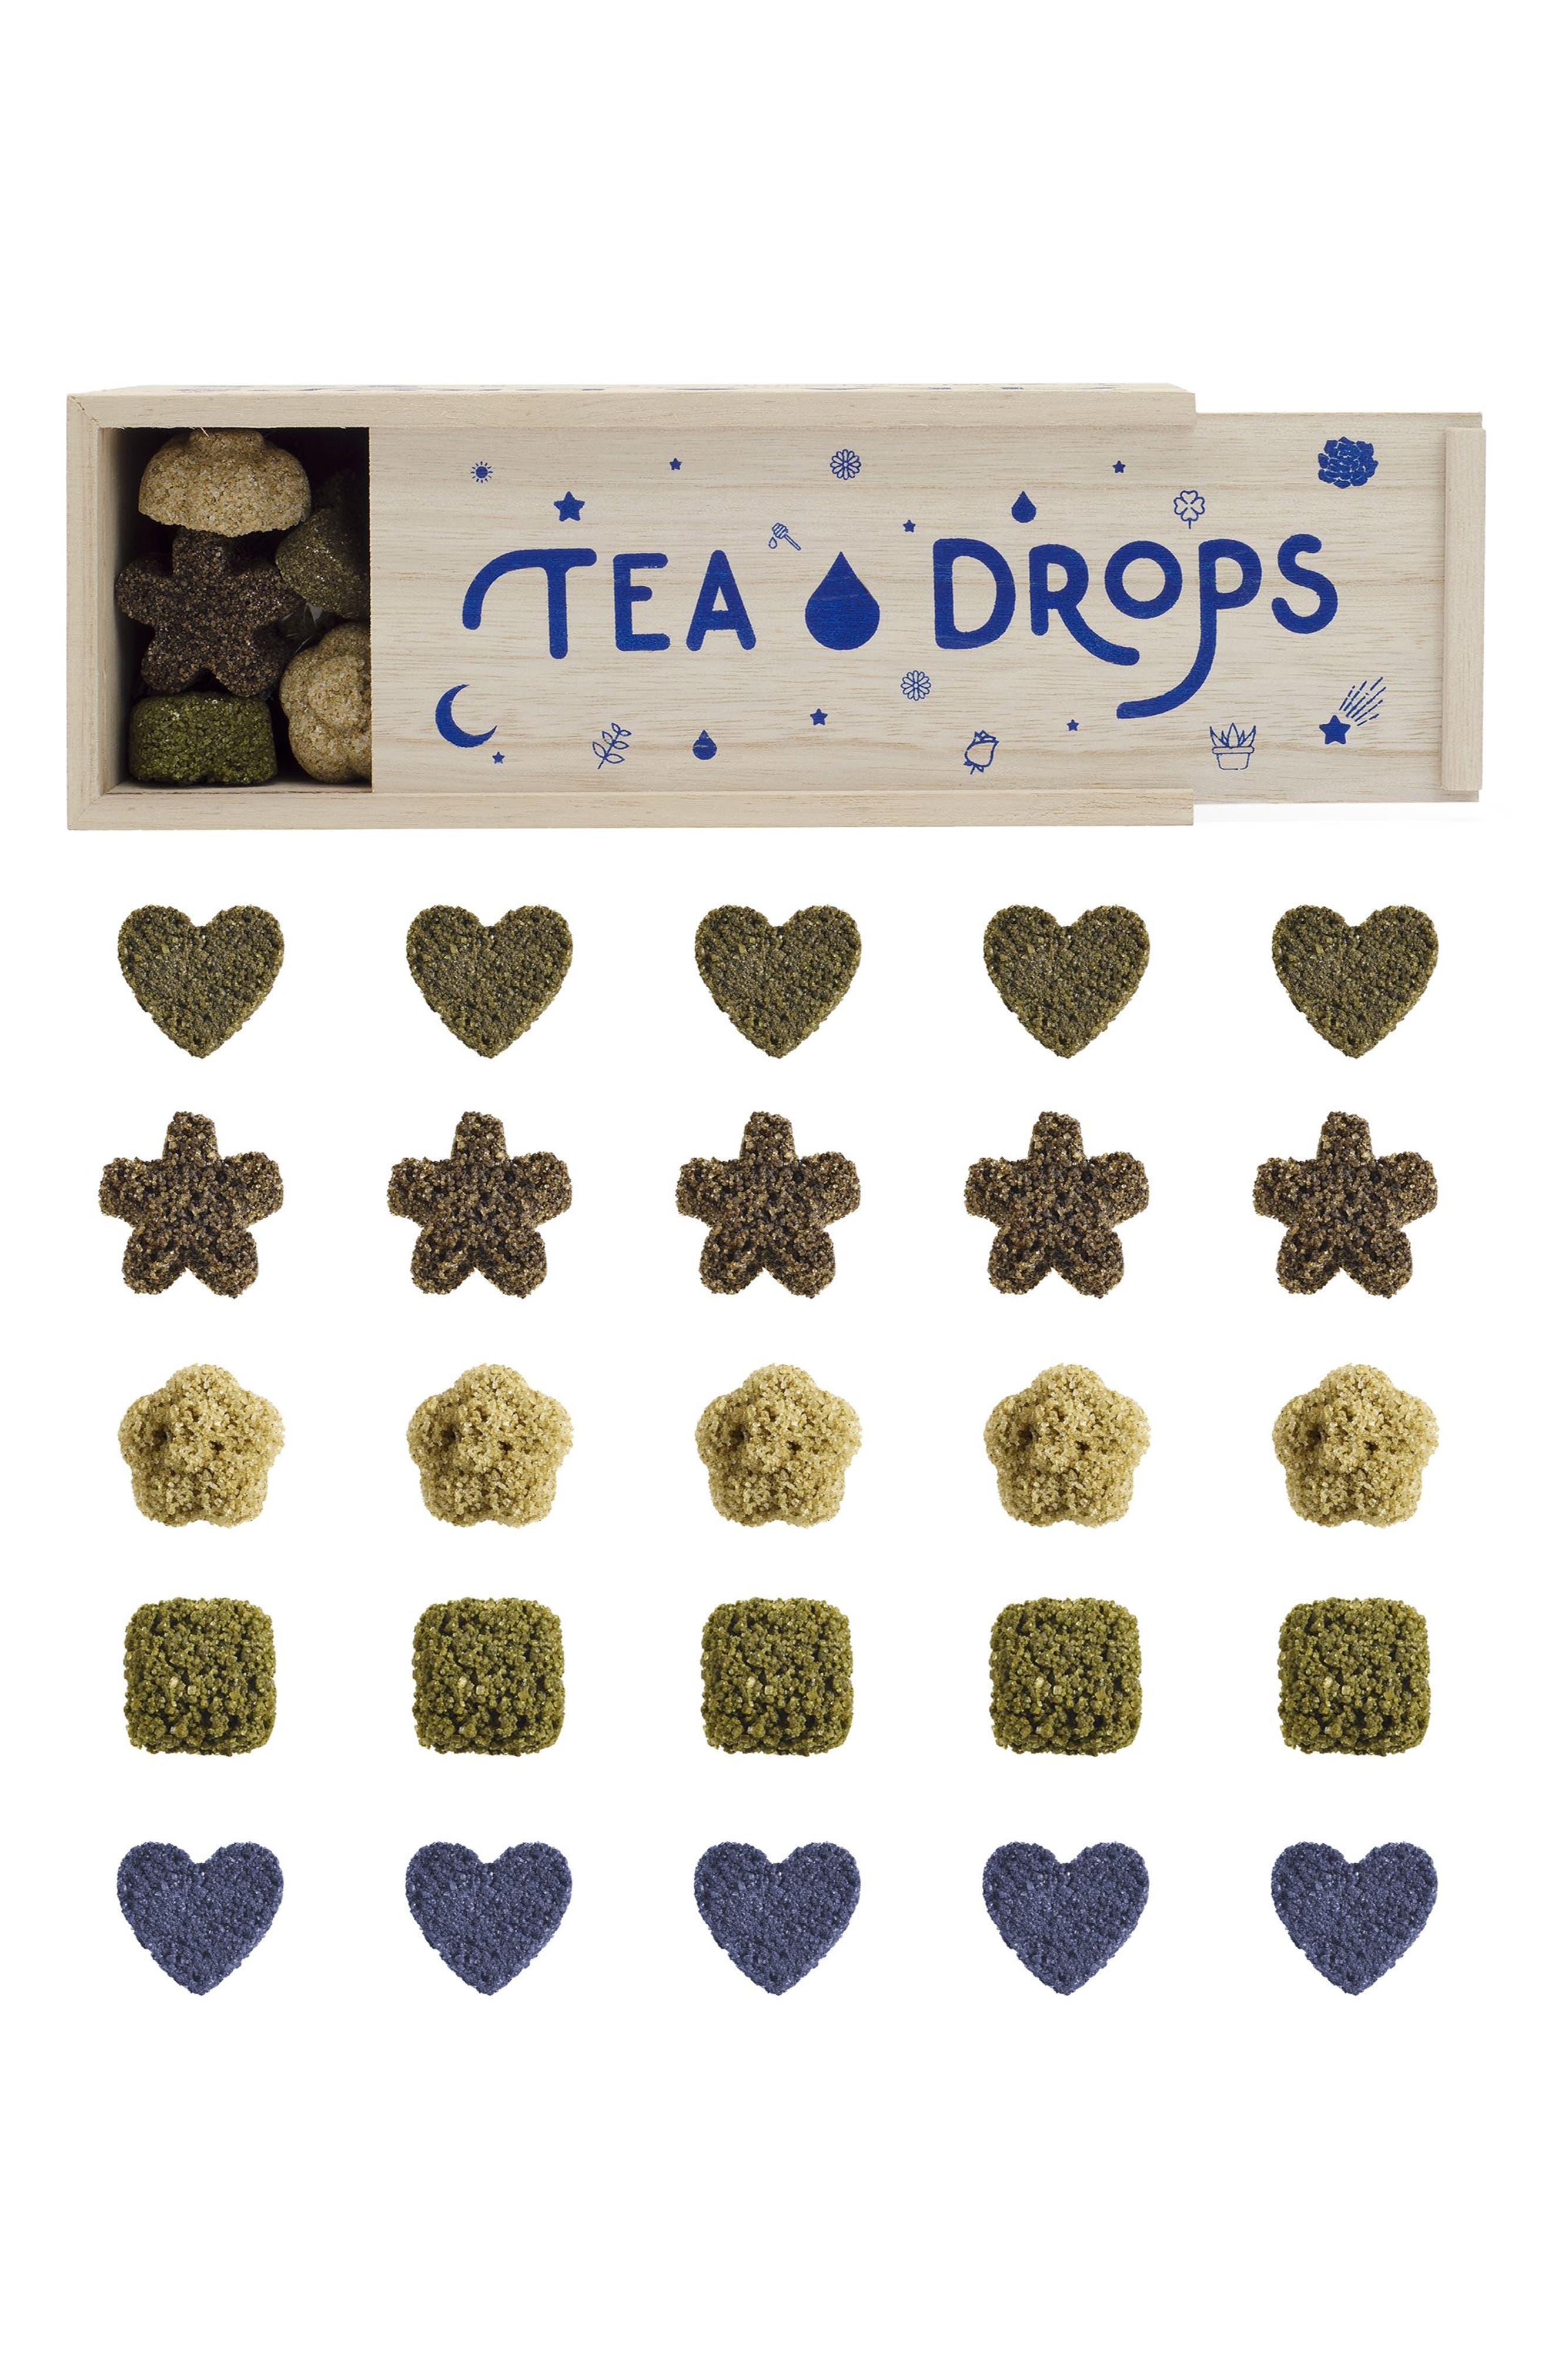 TEA DROPS,                             Large Assortment Box,                             Main thumbnail 1, color,                             WOOD/ BROWN